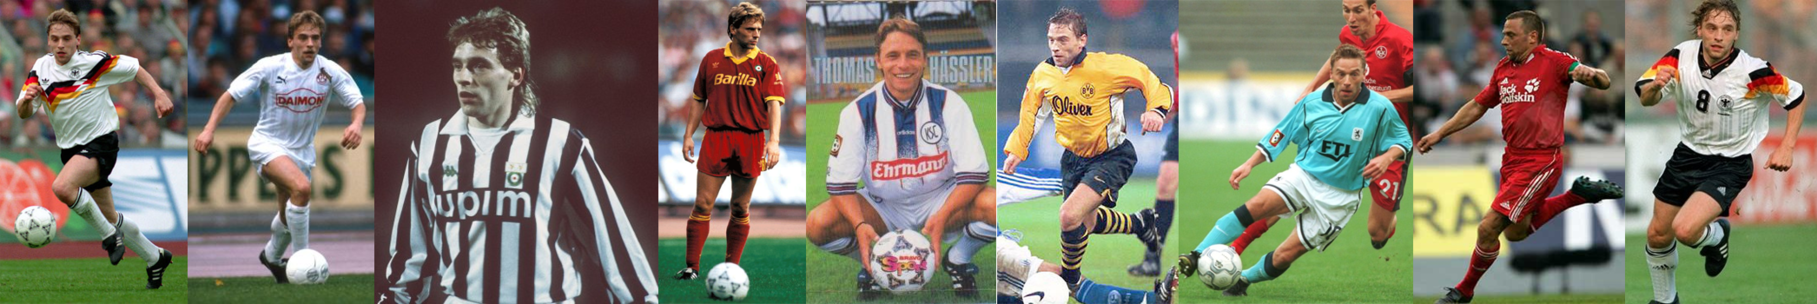 RFA - Cologne - Juventus Turin - AS Rome - Karlsruhe - Borussia Dortmund - Munich 1860 - Austria Salzbourg - Allemagne - click to enlarge